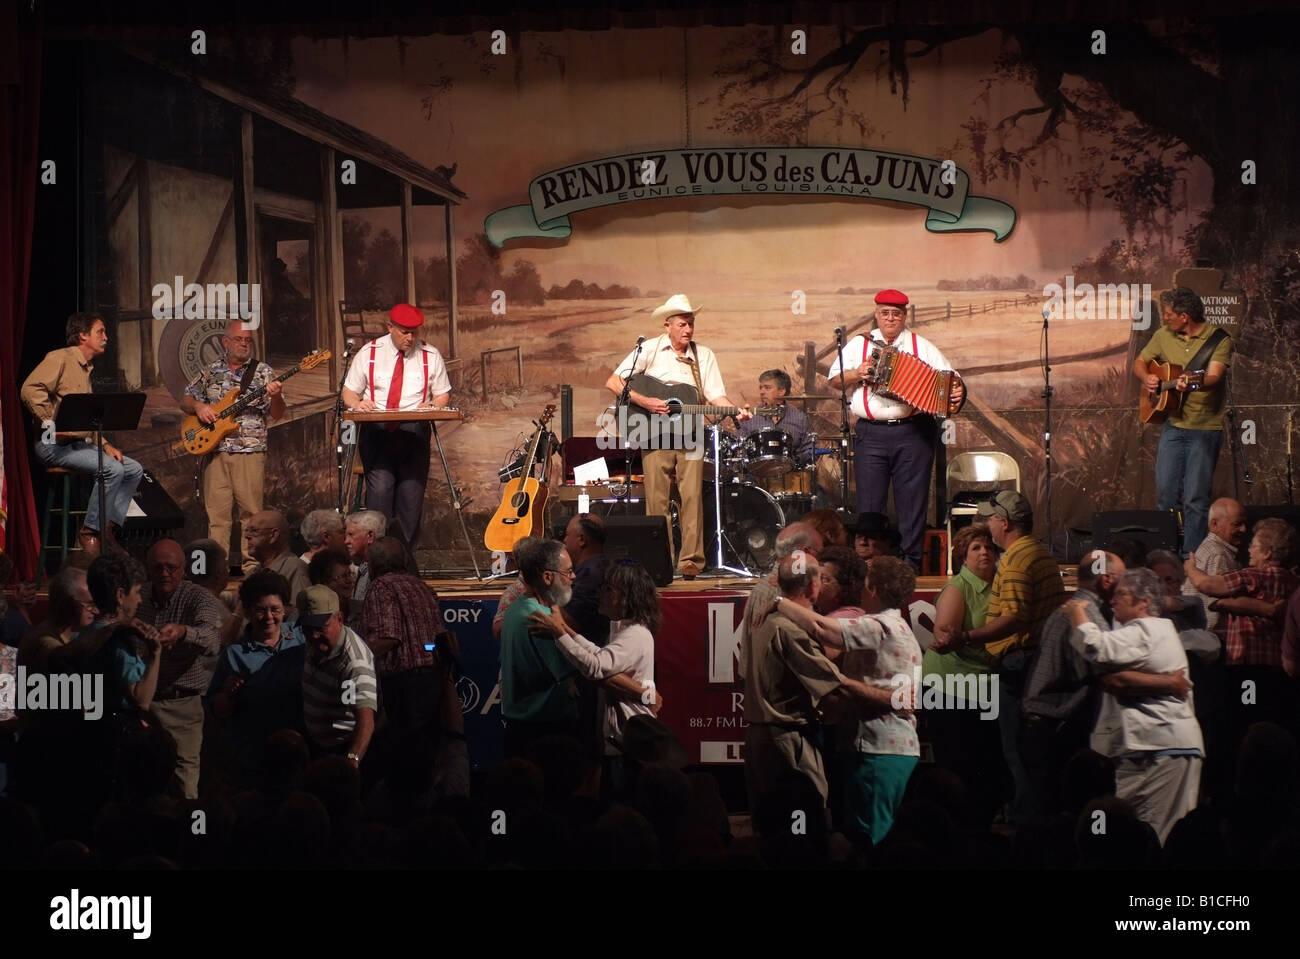 usa-louisiana-la-cajun-country-eunice-liberty-theater-live-radio-show-B1CFH0.jpg